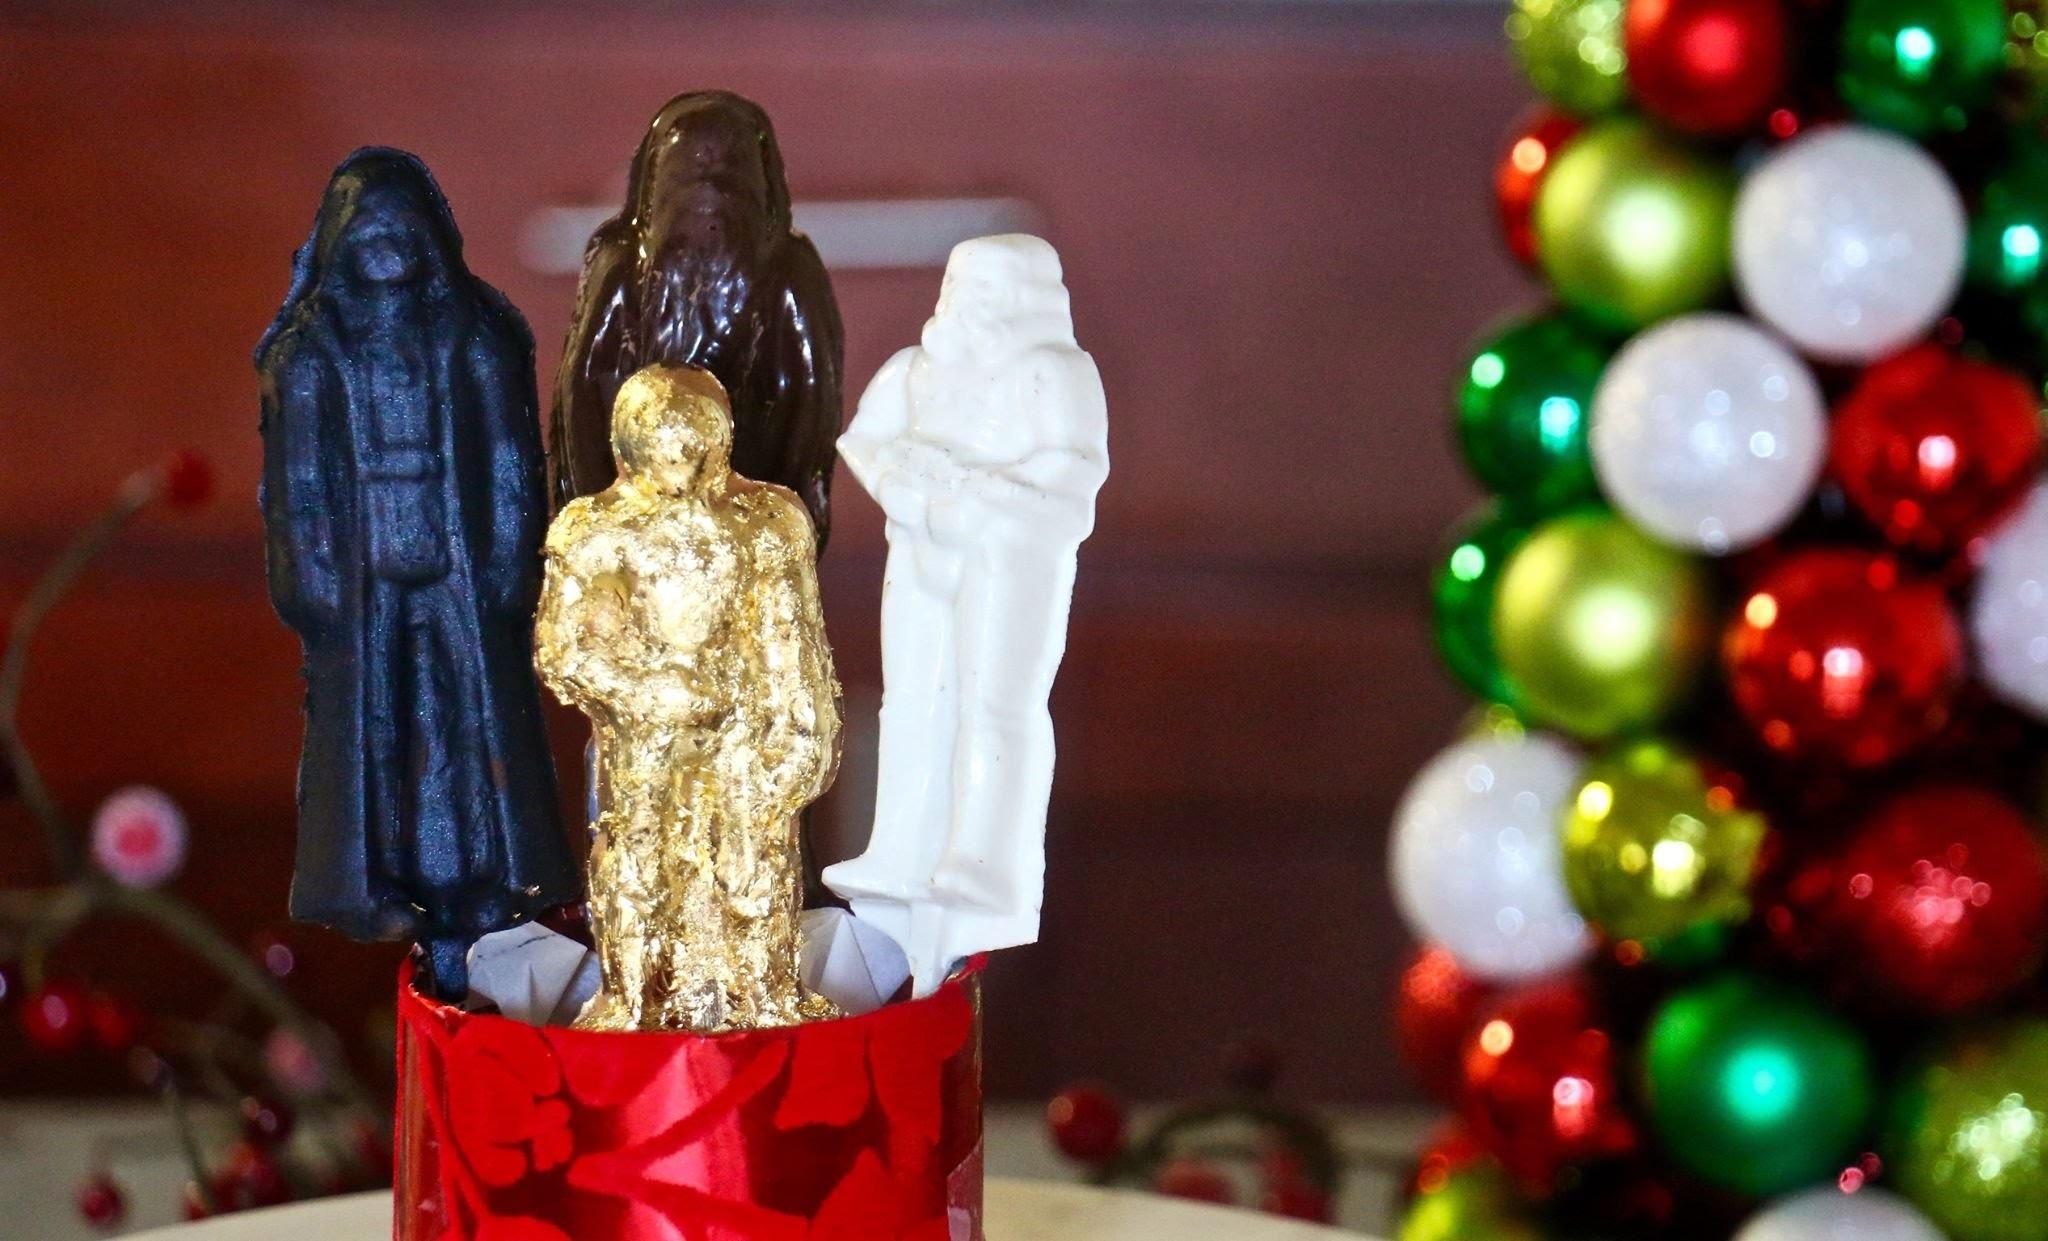 DIY: Star Wars Chocolate Suckers (edible christmas gifts) - Kena Peay (Day 12)